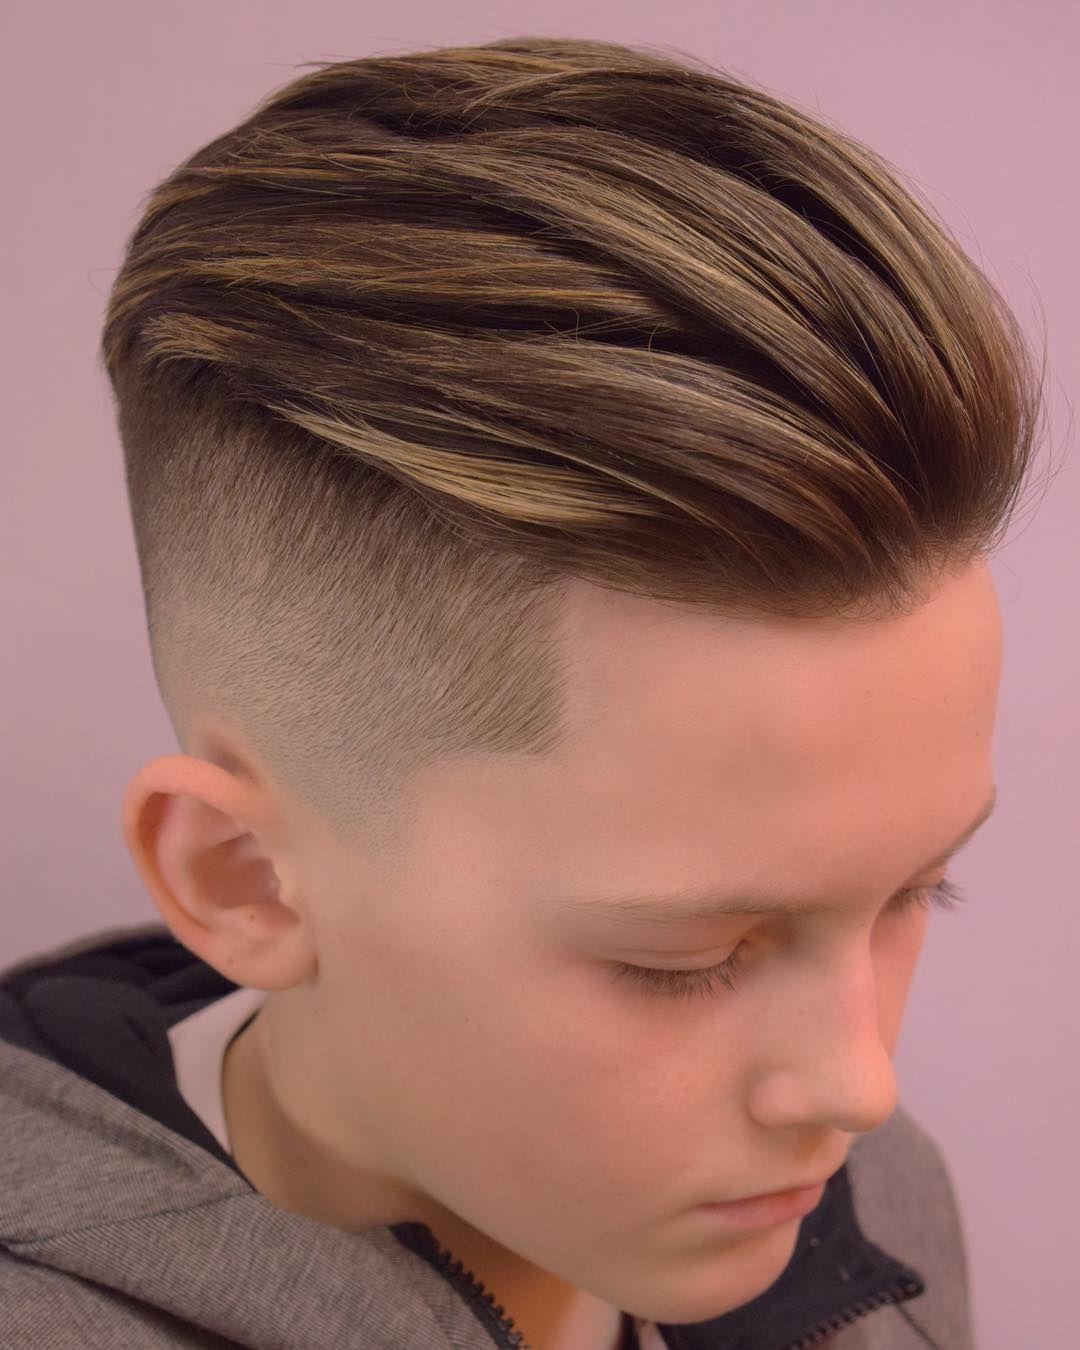 Undercuts hairstyles boys  hare  Pinterest  Svadobné torty